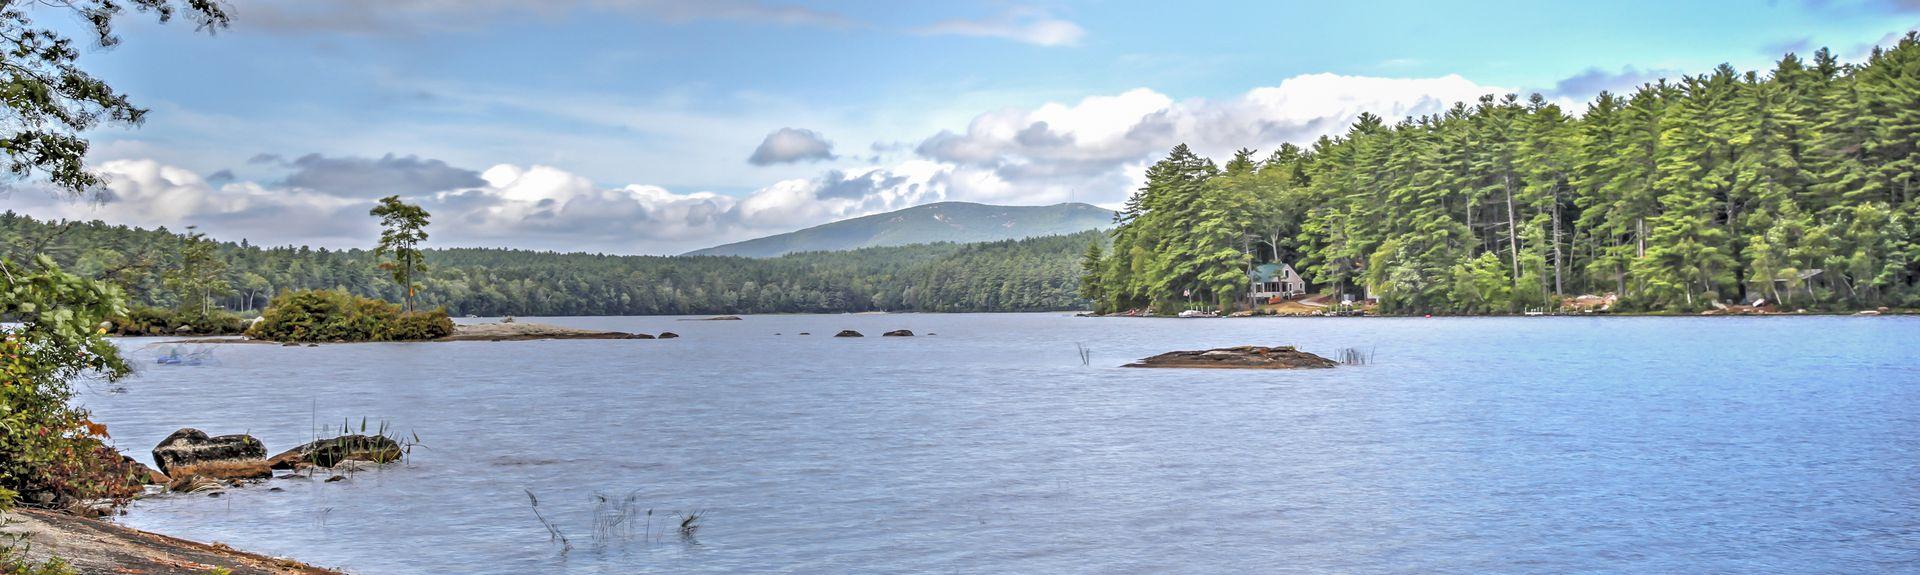 Hiram, Maine, United States of America